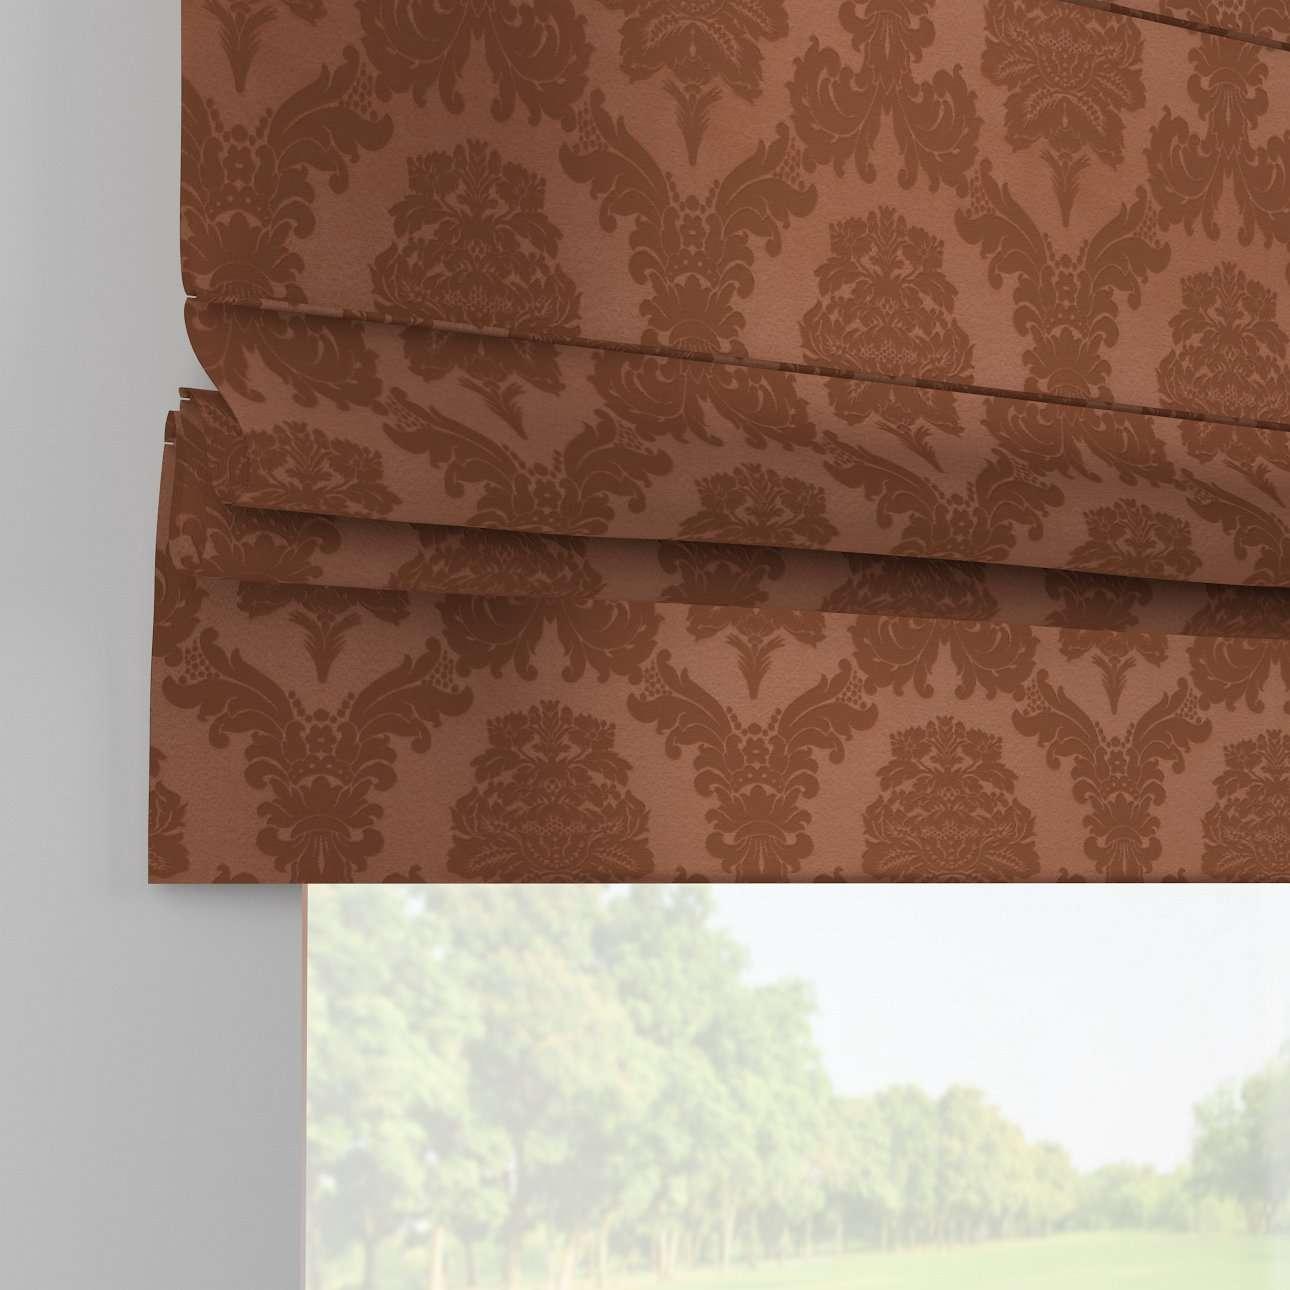 Rímska roleta Padva 80 × 170 cm V kolekcii Damasco, tkanina: 613-88